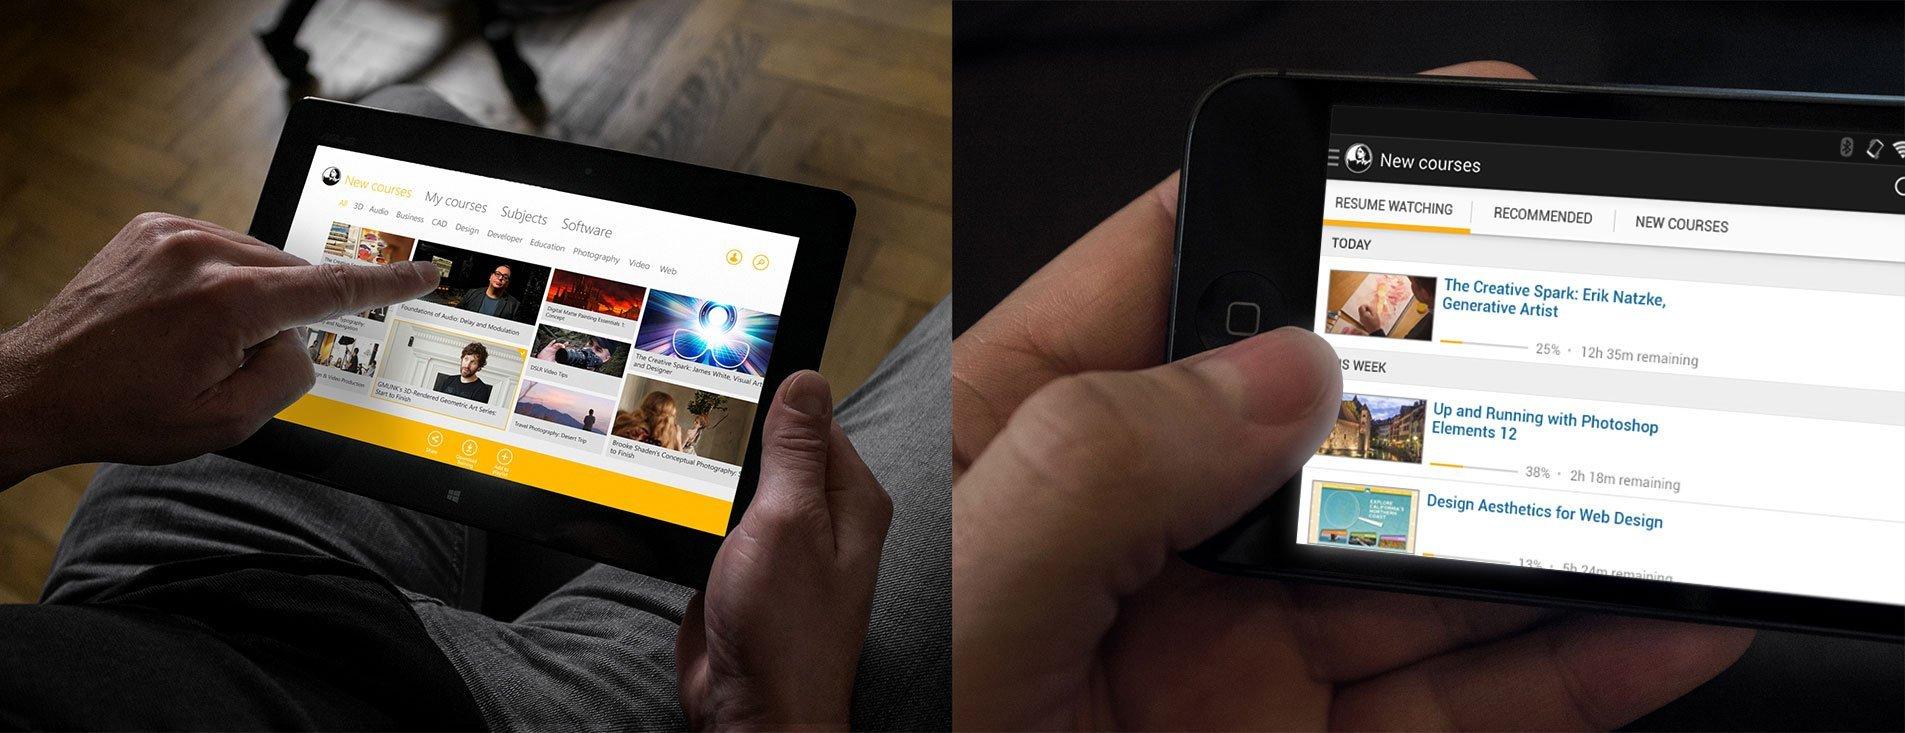 lynda.com device mockups